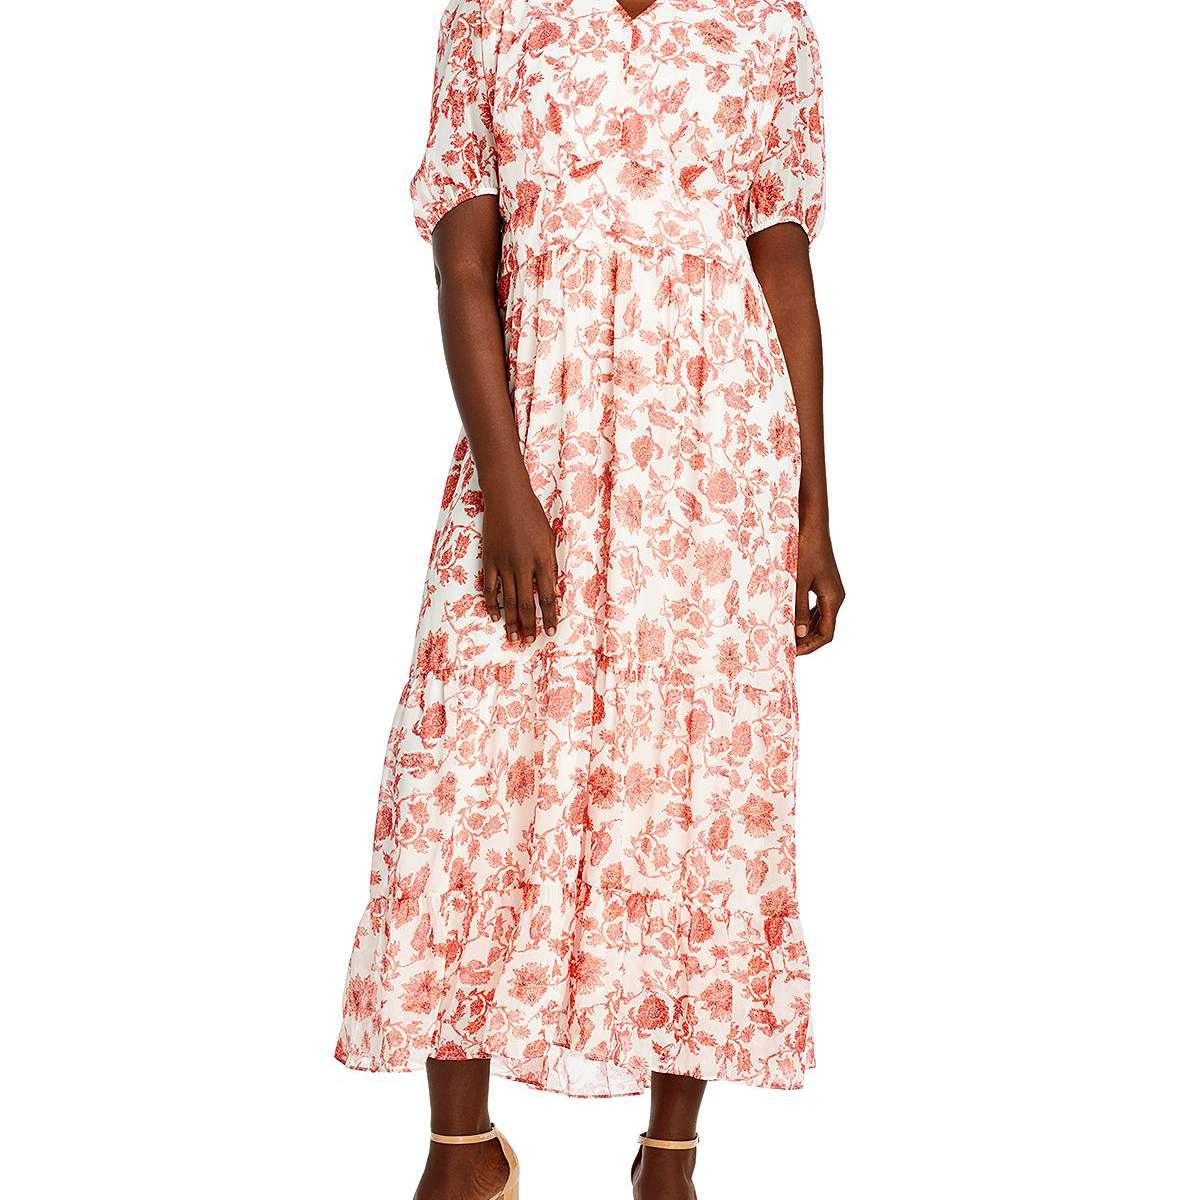 AQUA Curve Floral Print Tiered Dress, $88, on sale $61.60